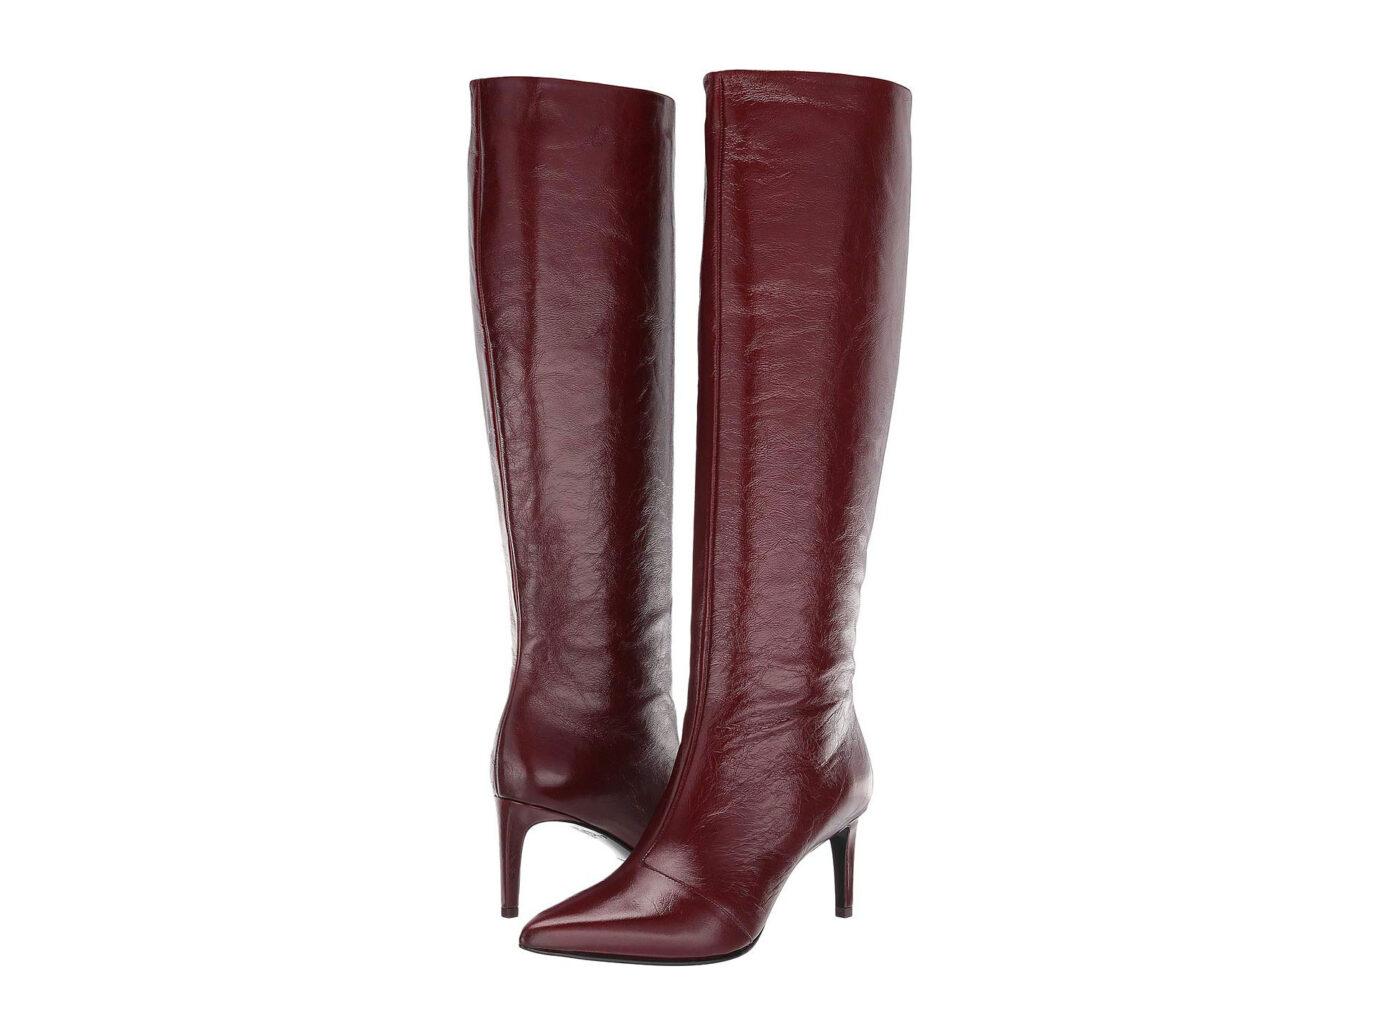 Rag & Bone Beha Knee High Boot